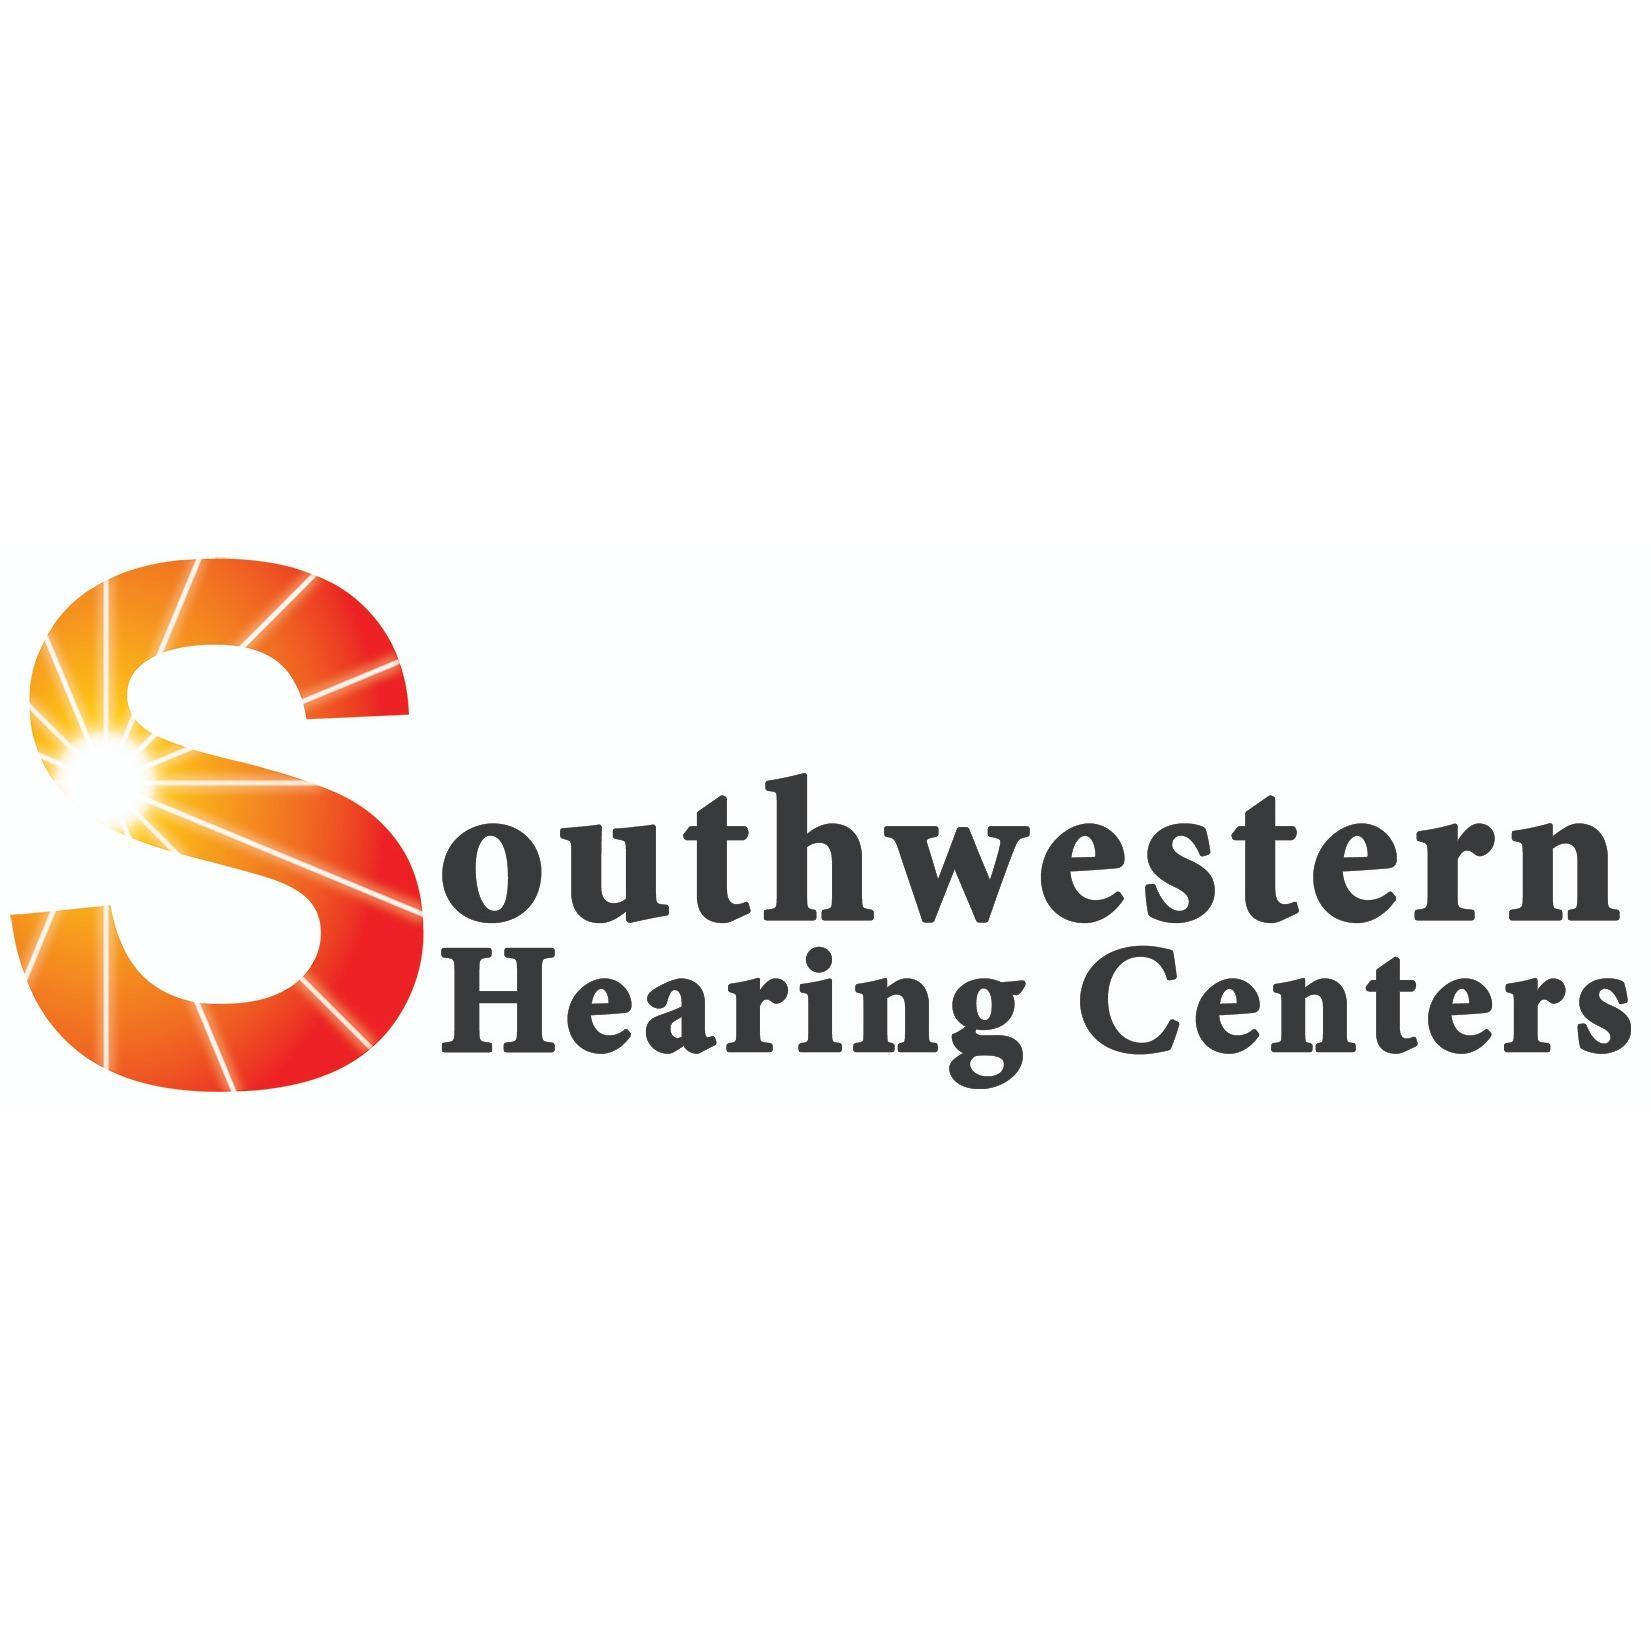 Southwestern Hearing Centers